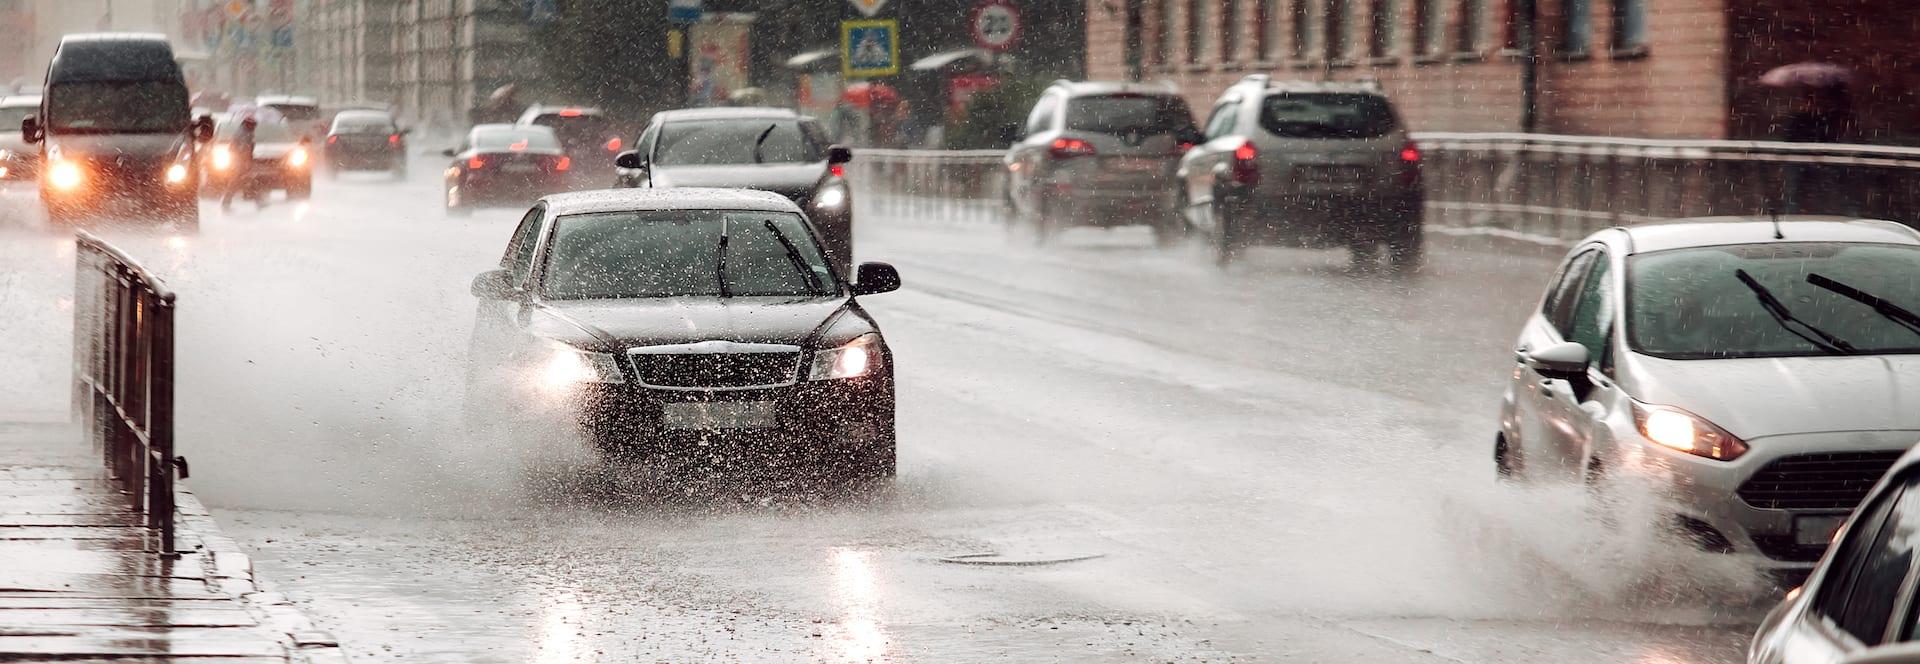 Rainy Streets Personal Injury